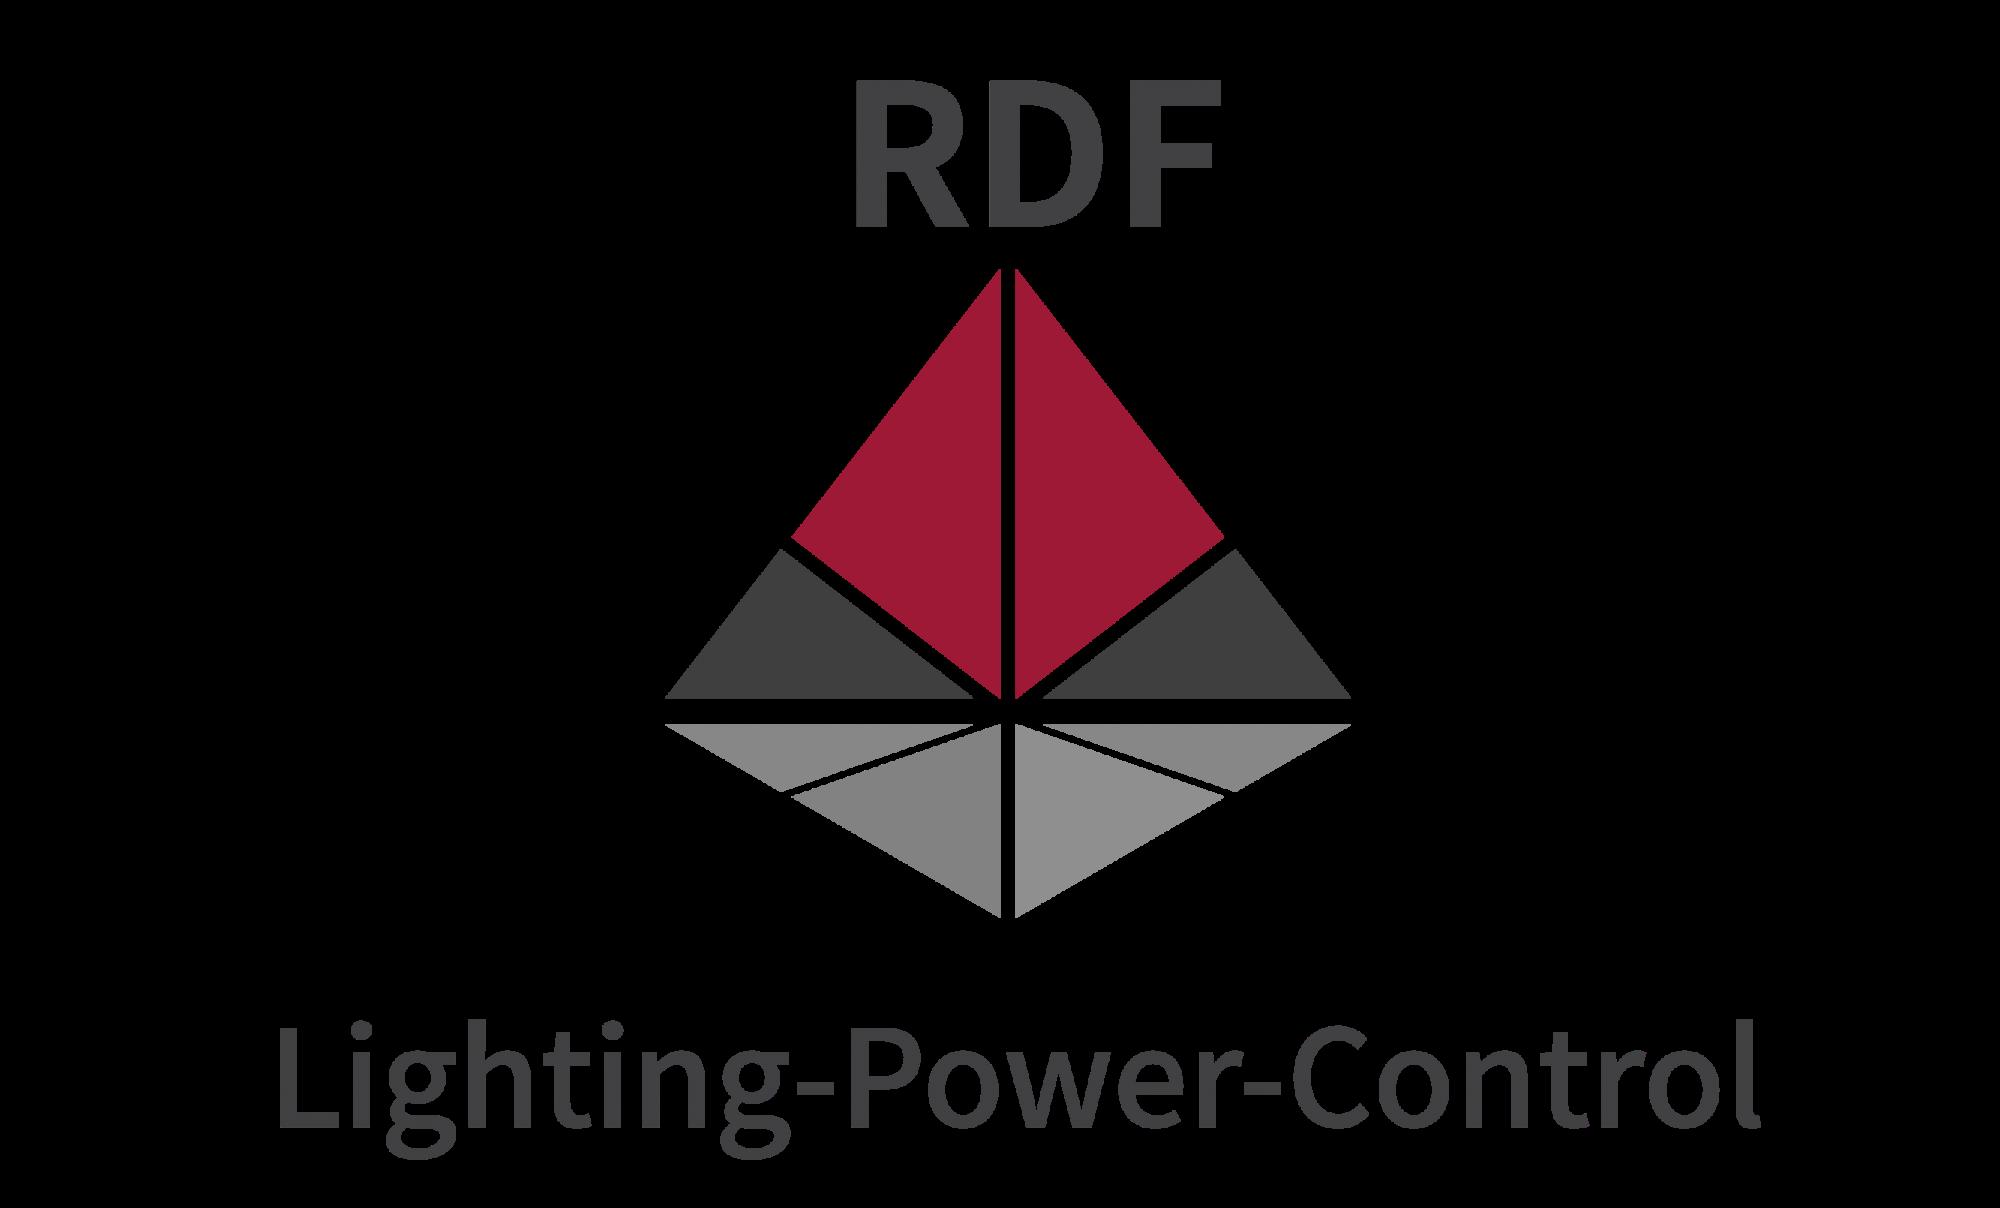 RDF Lighting